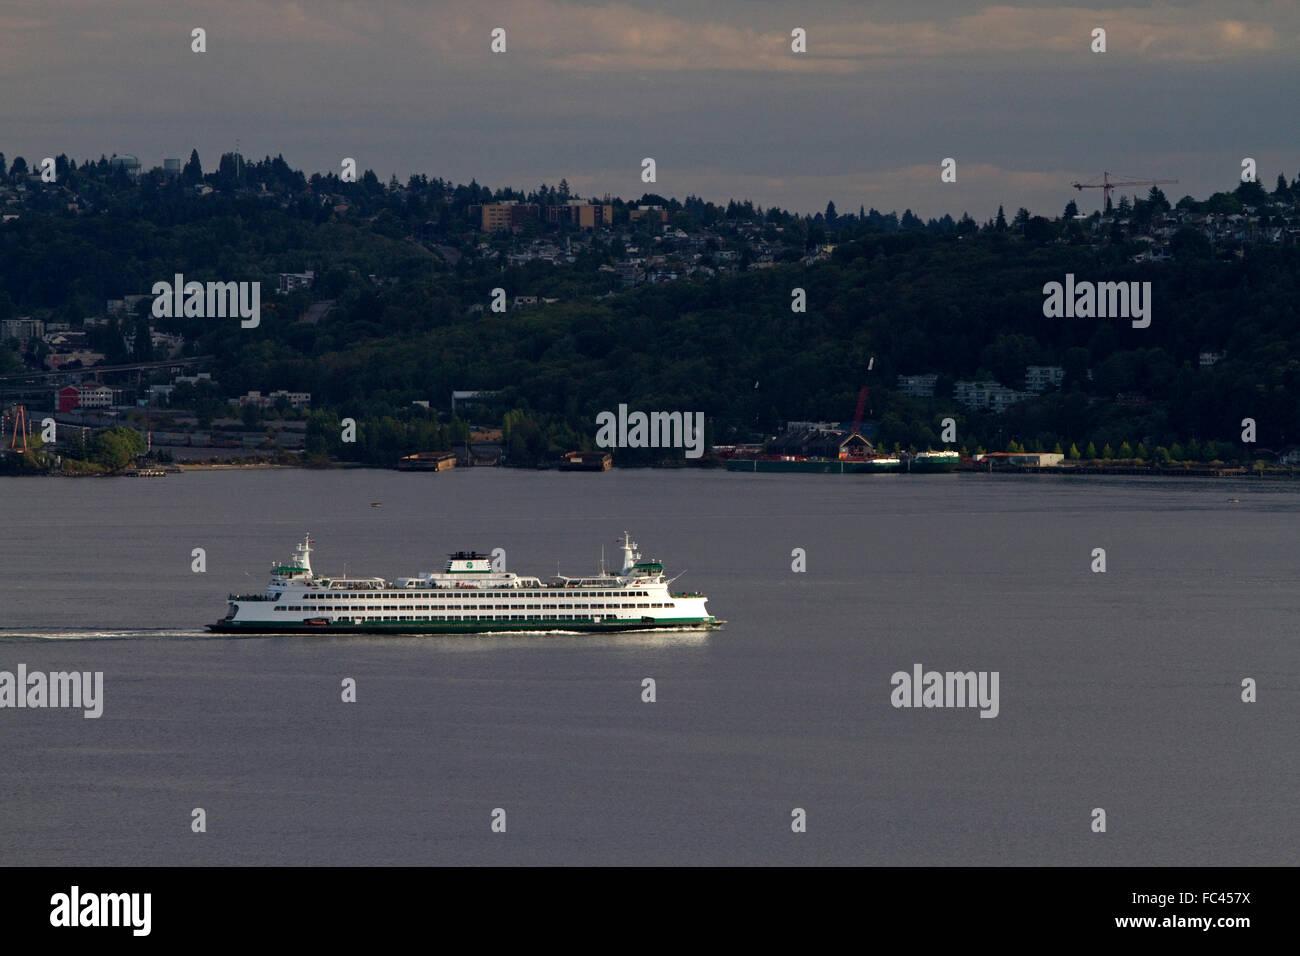 Washington State Ferry in Elliott Bay, Seattle, Washigton, USA. - Stock Image